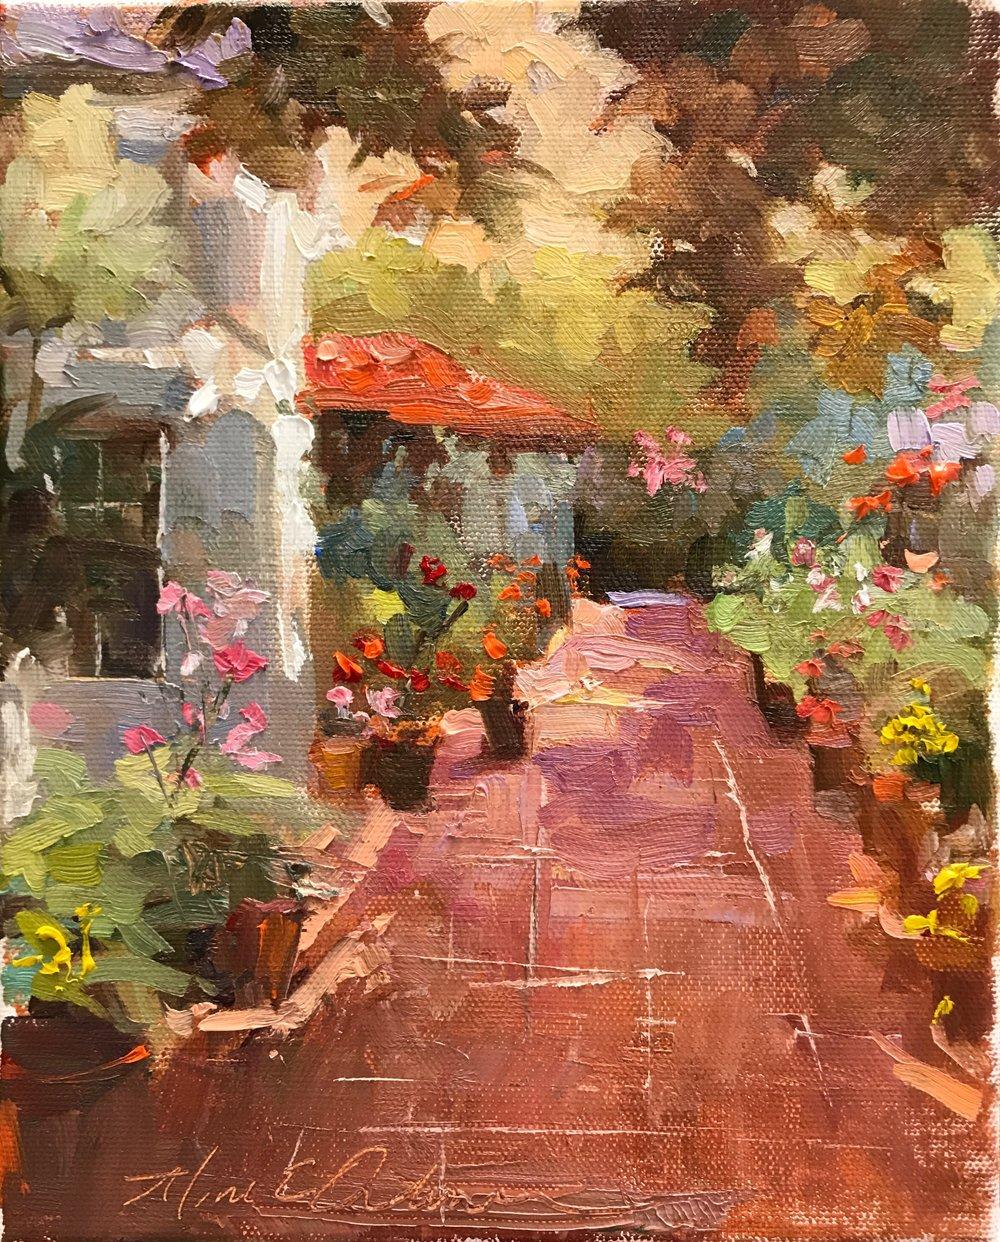 Nicky's Garden 9 x 12 oil on canvas